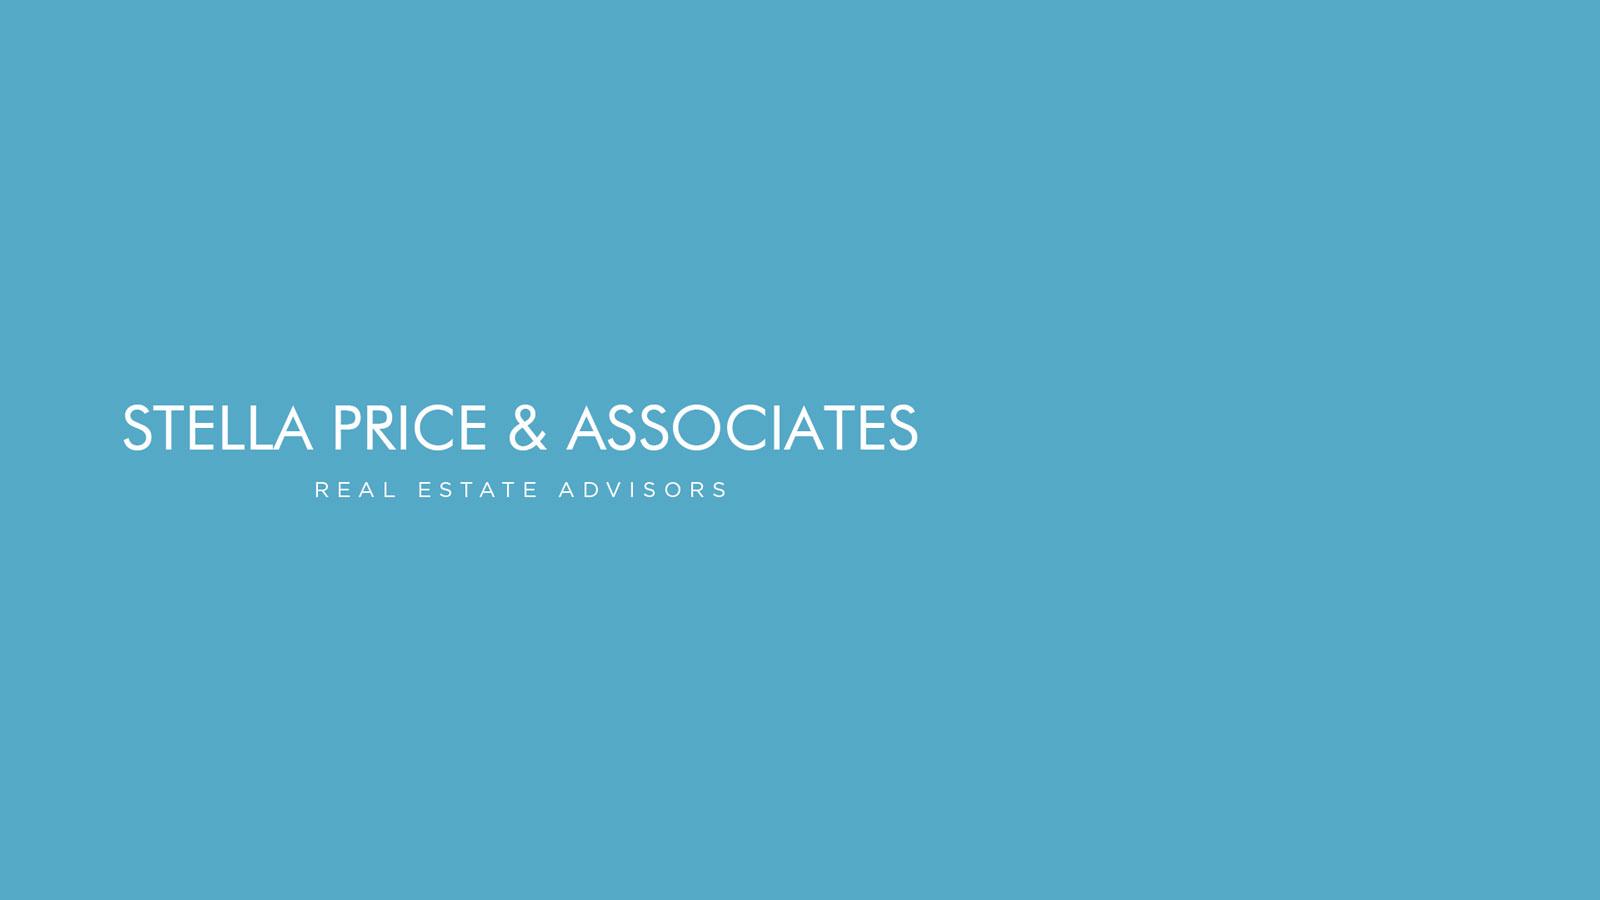 web-design-and-logo-designer-for-Stella-Price-01